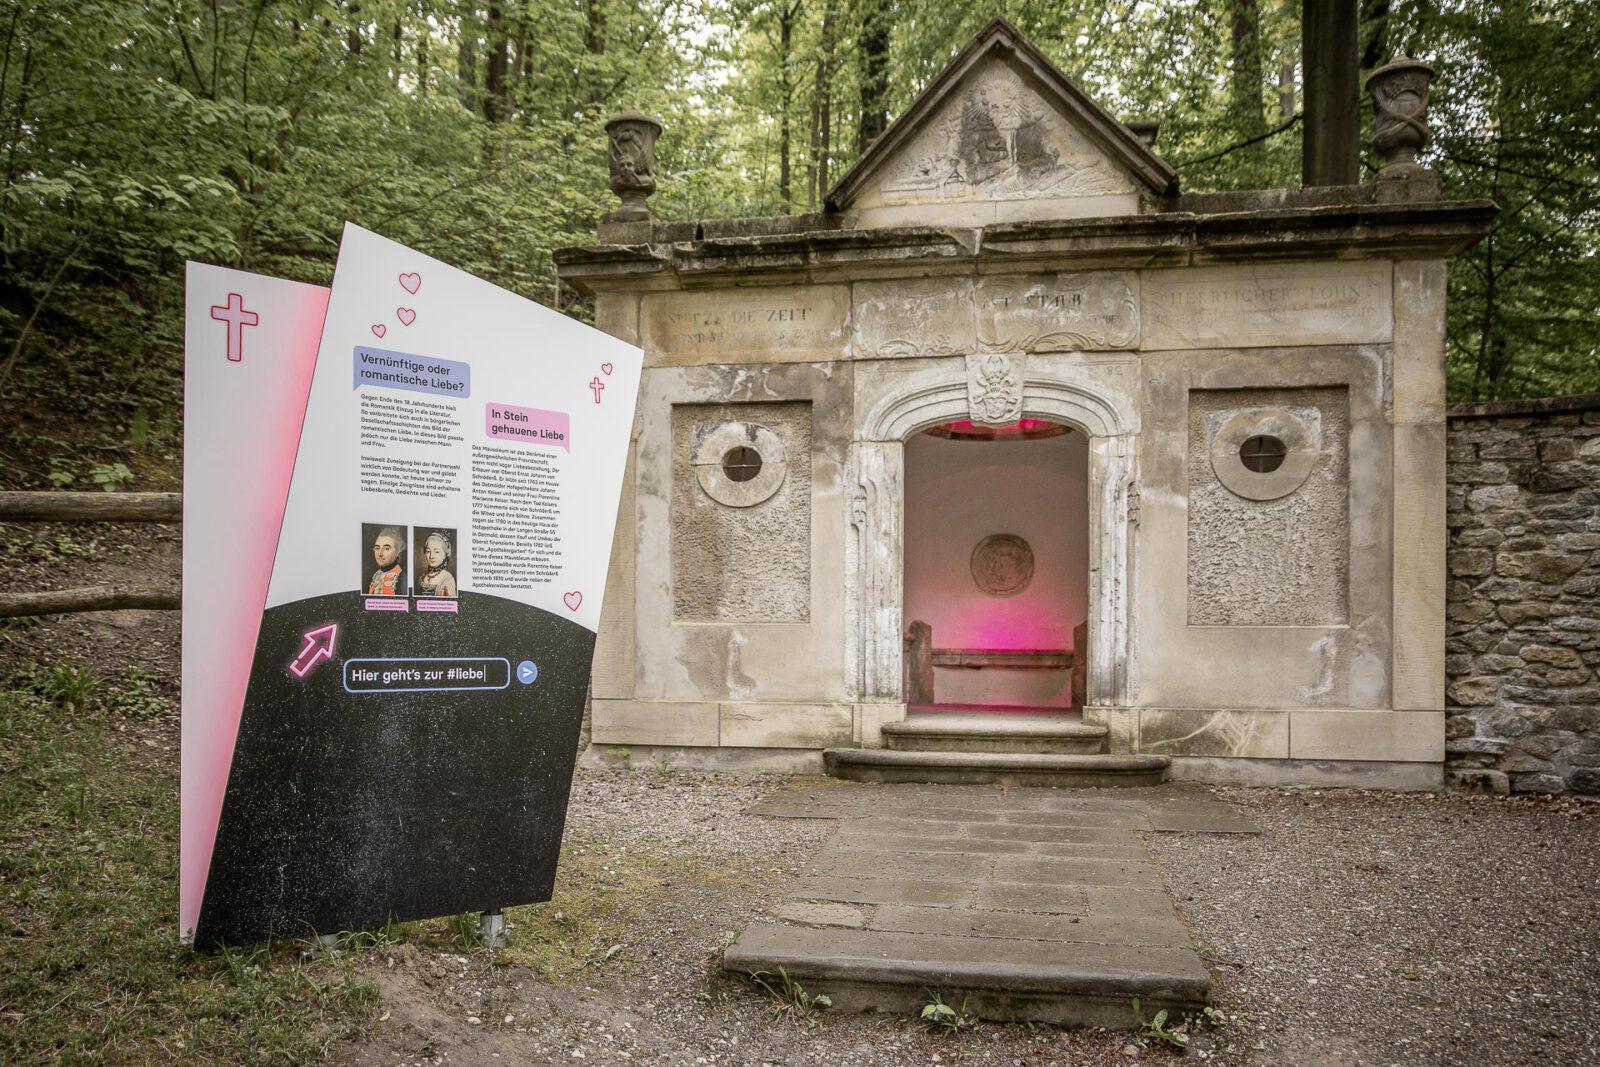 5_M_Bok_liebe_Freilichtmuseum-Detmold_08-05-2019_TE_6449